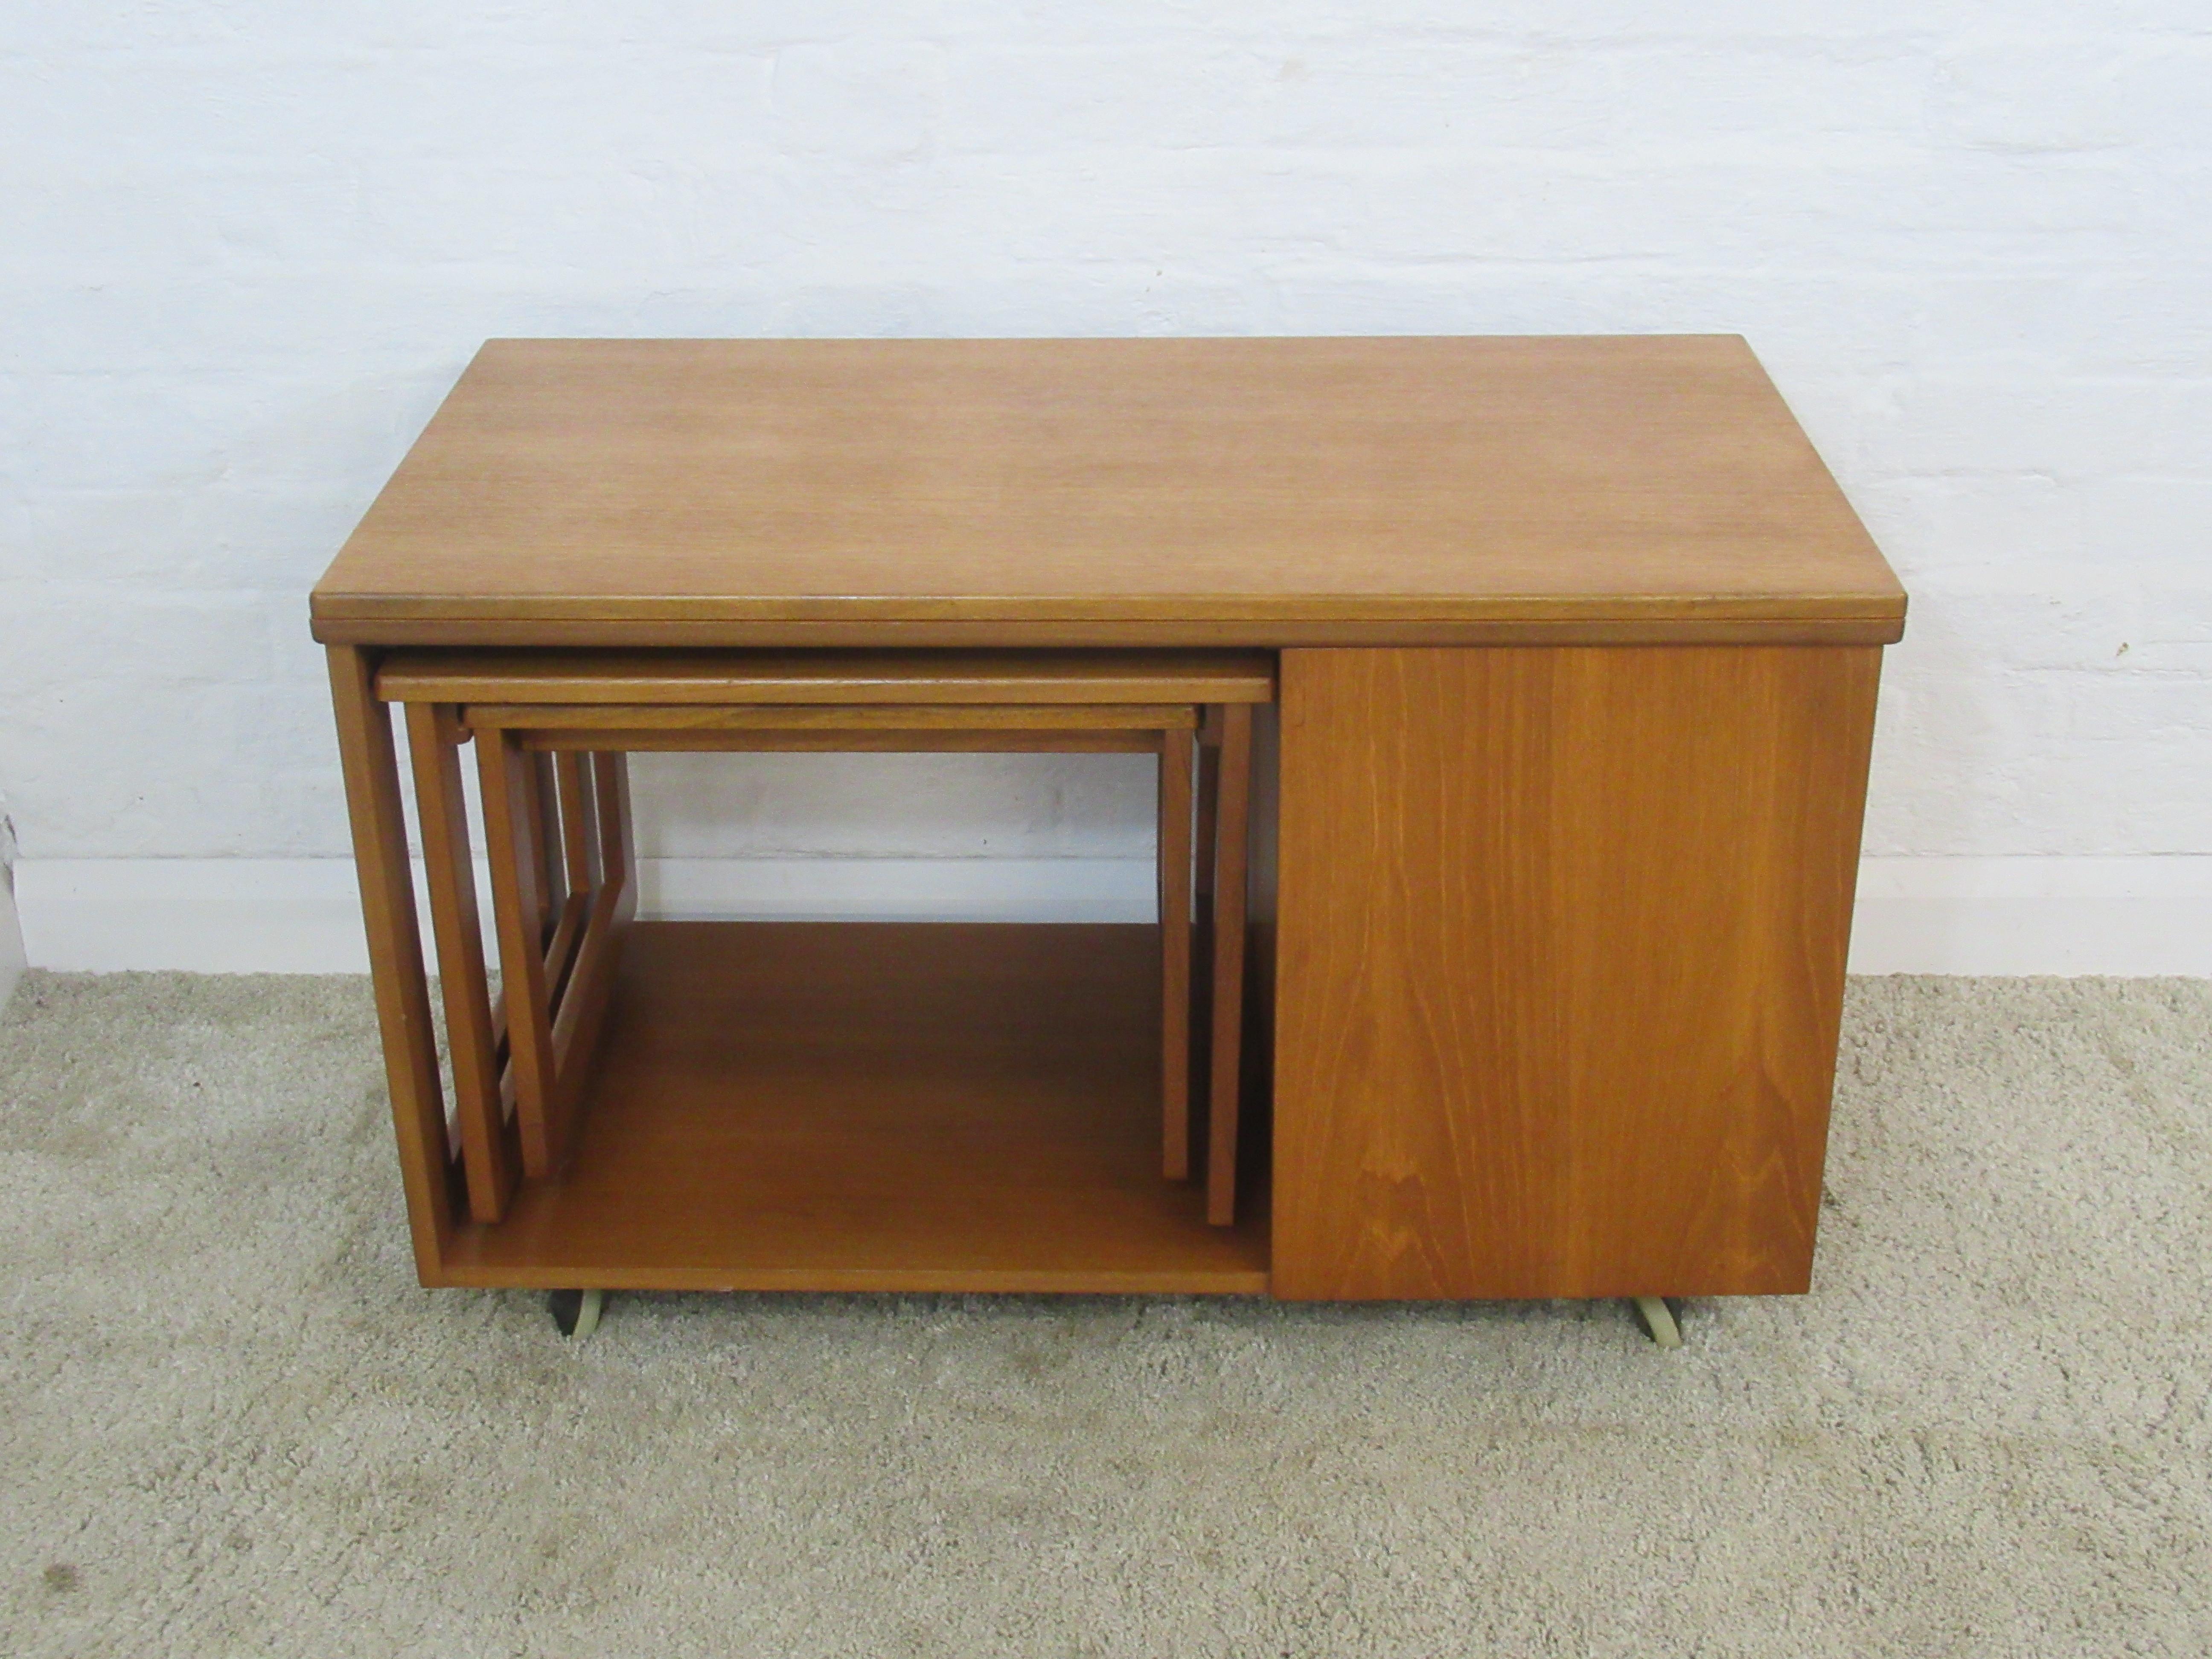 Coffee Table Extendable.Retro 1960s 70s Mc Intosh Tristor Teak Extending Coffee Table With Nest Storage